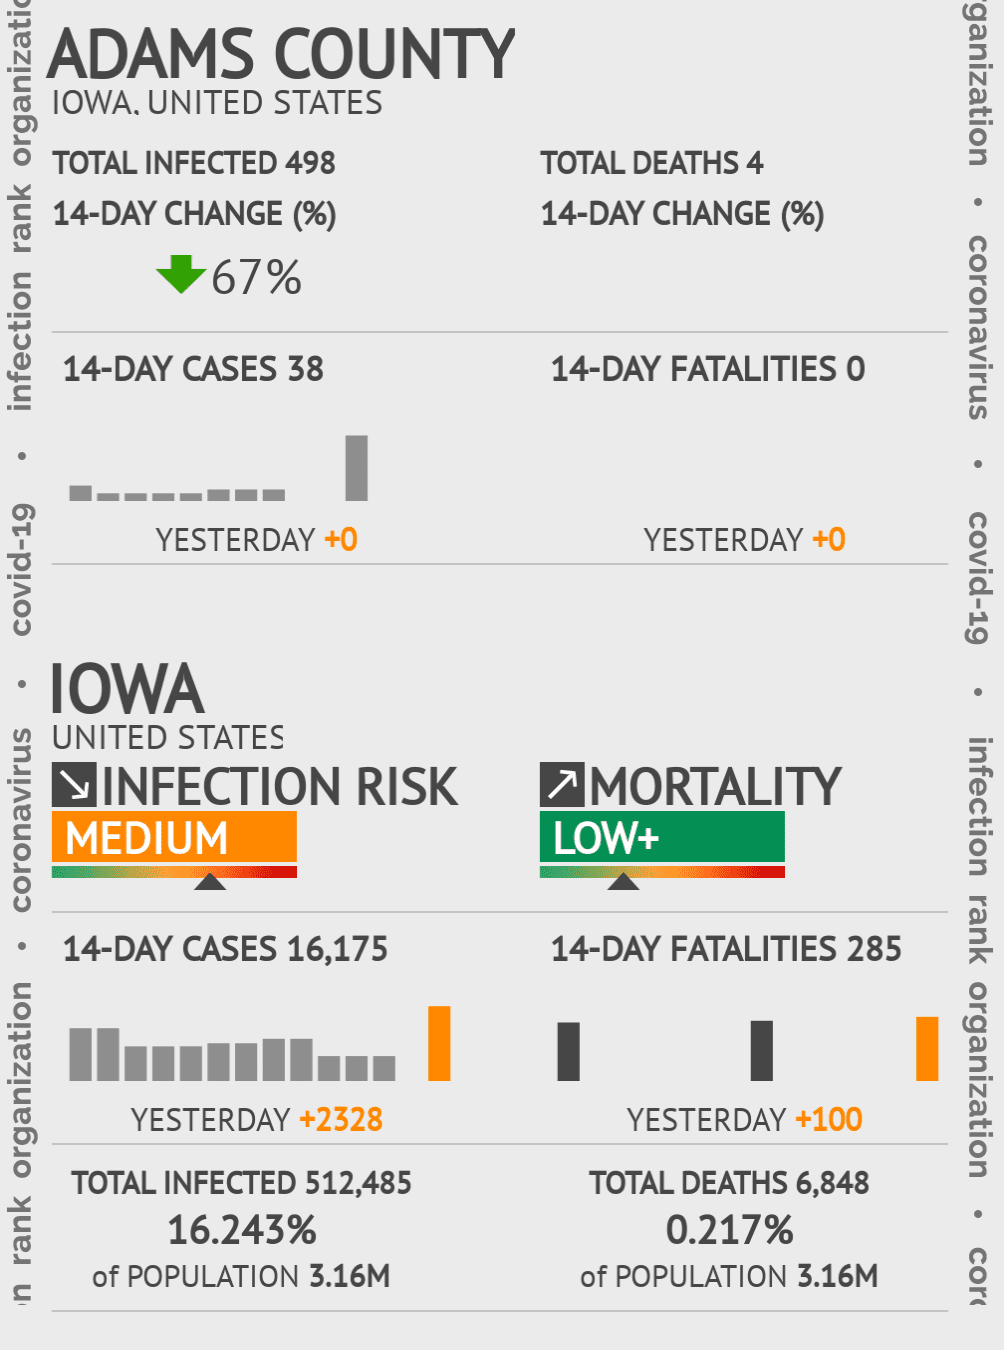 Adams County Coronavirus Covid-19 Risk of Infection on July 24, 2021